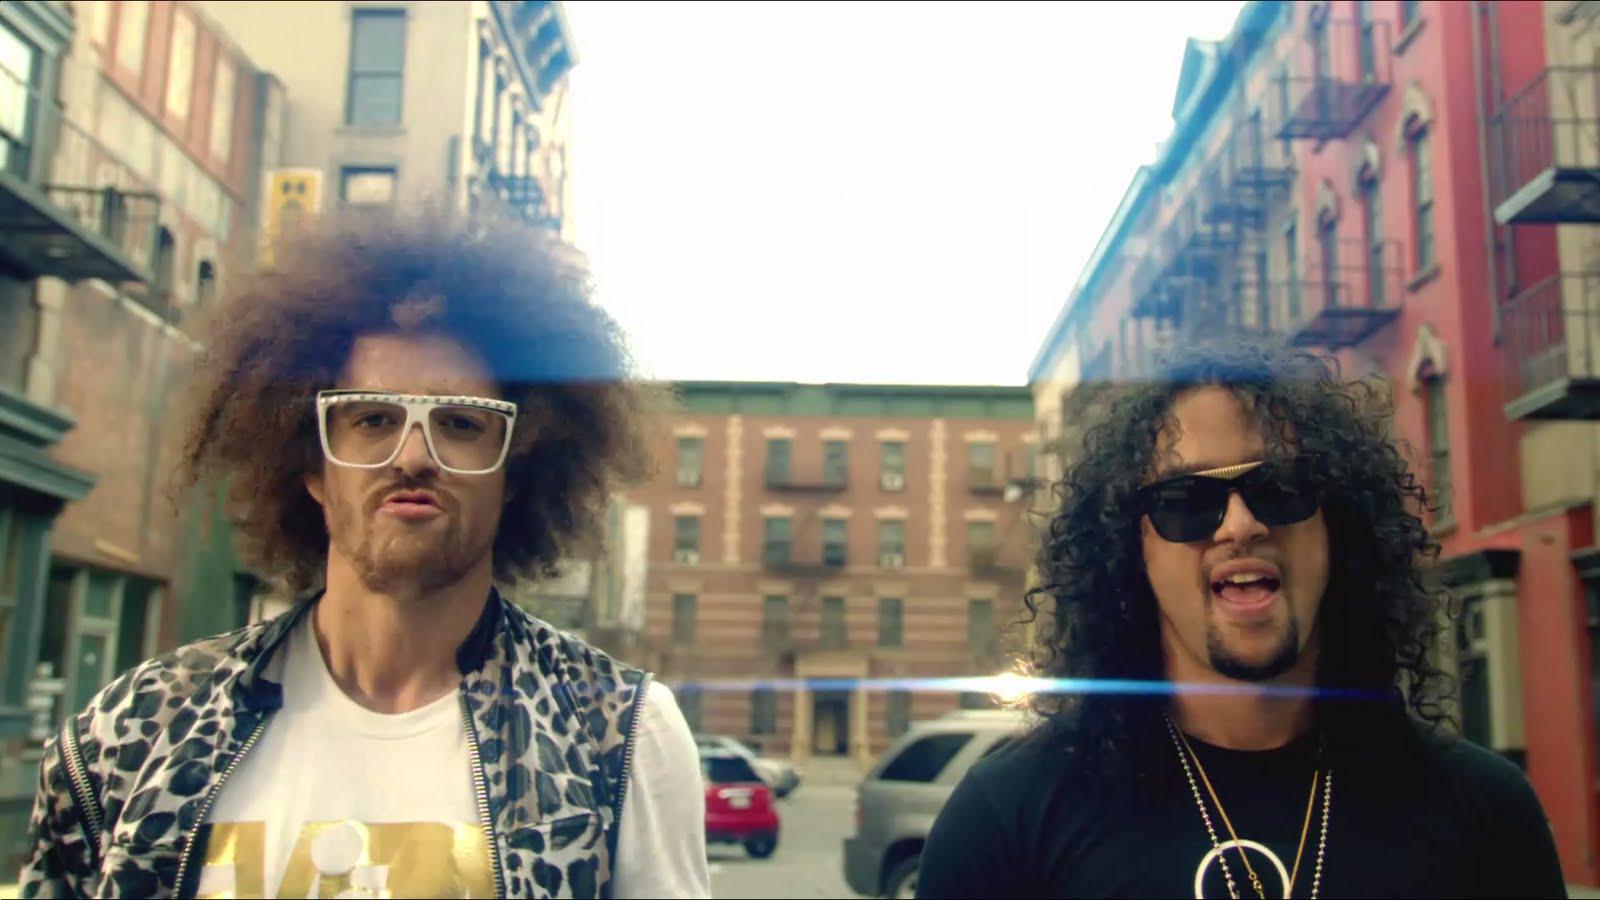 LMFAO - Party Rock Anthem (2011) | Lyrics of songs